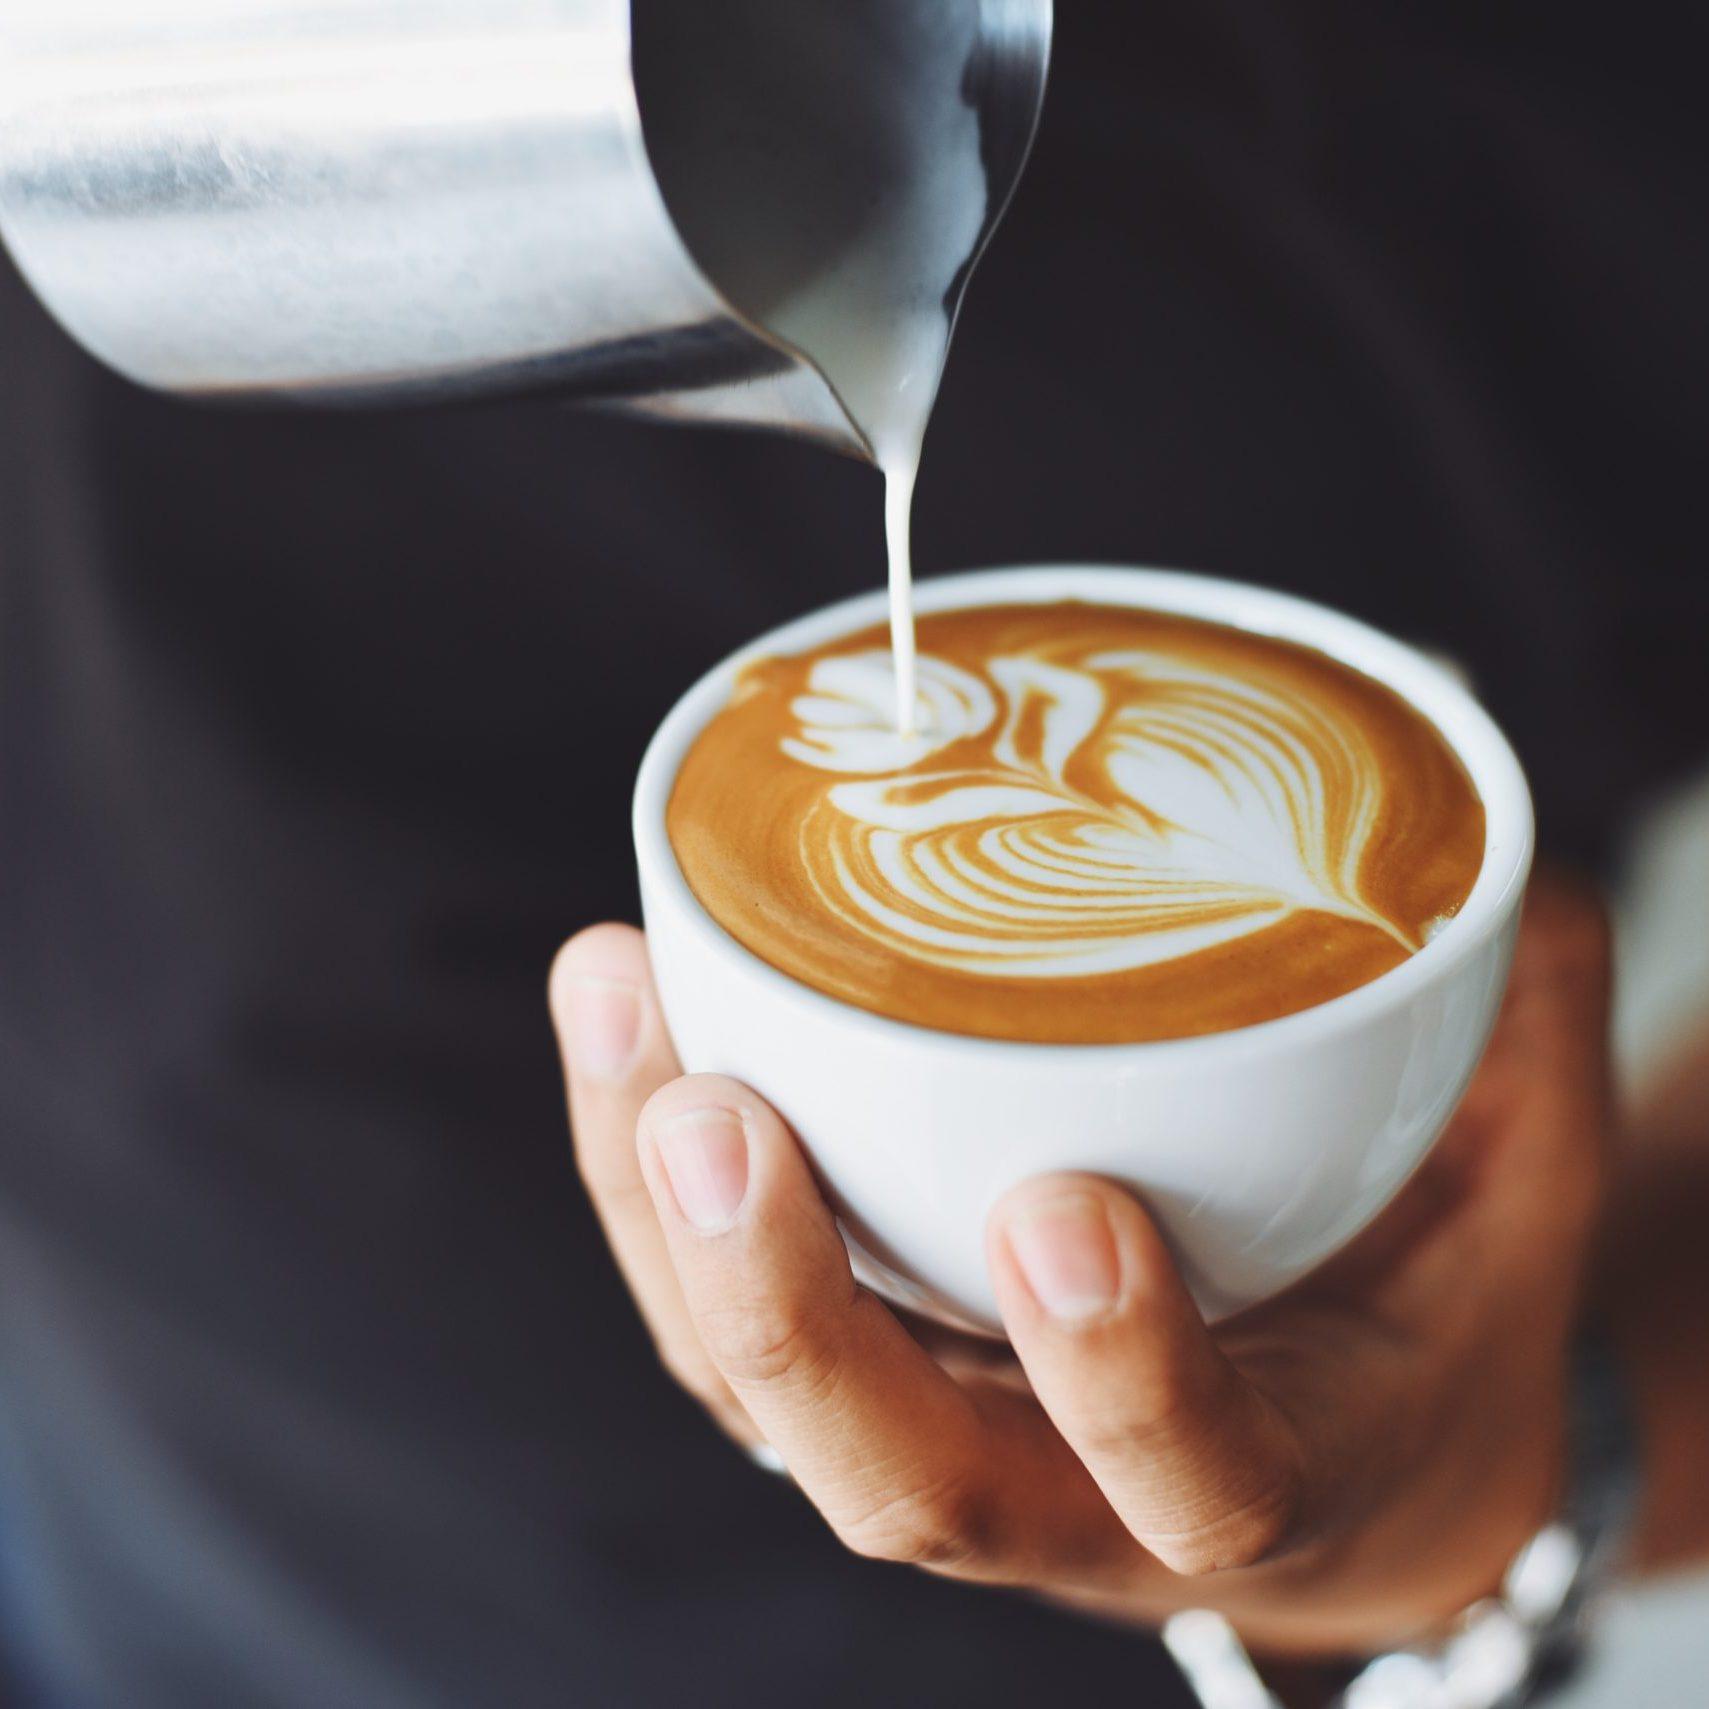 art-blur-cappuccino-close-up-302899